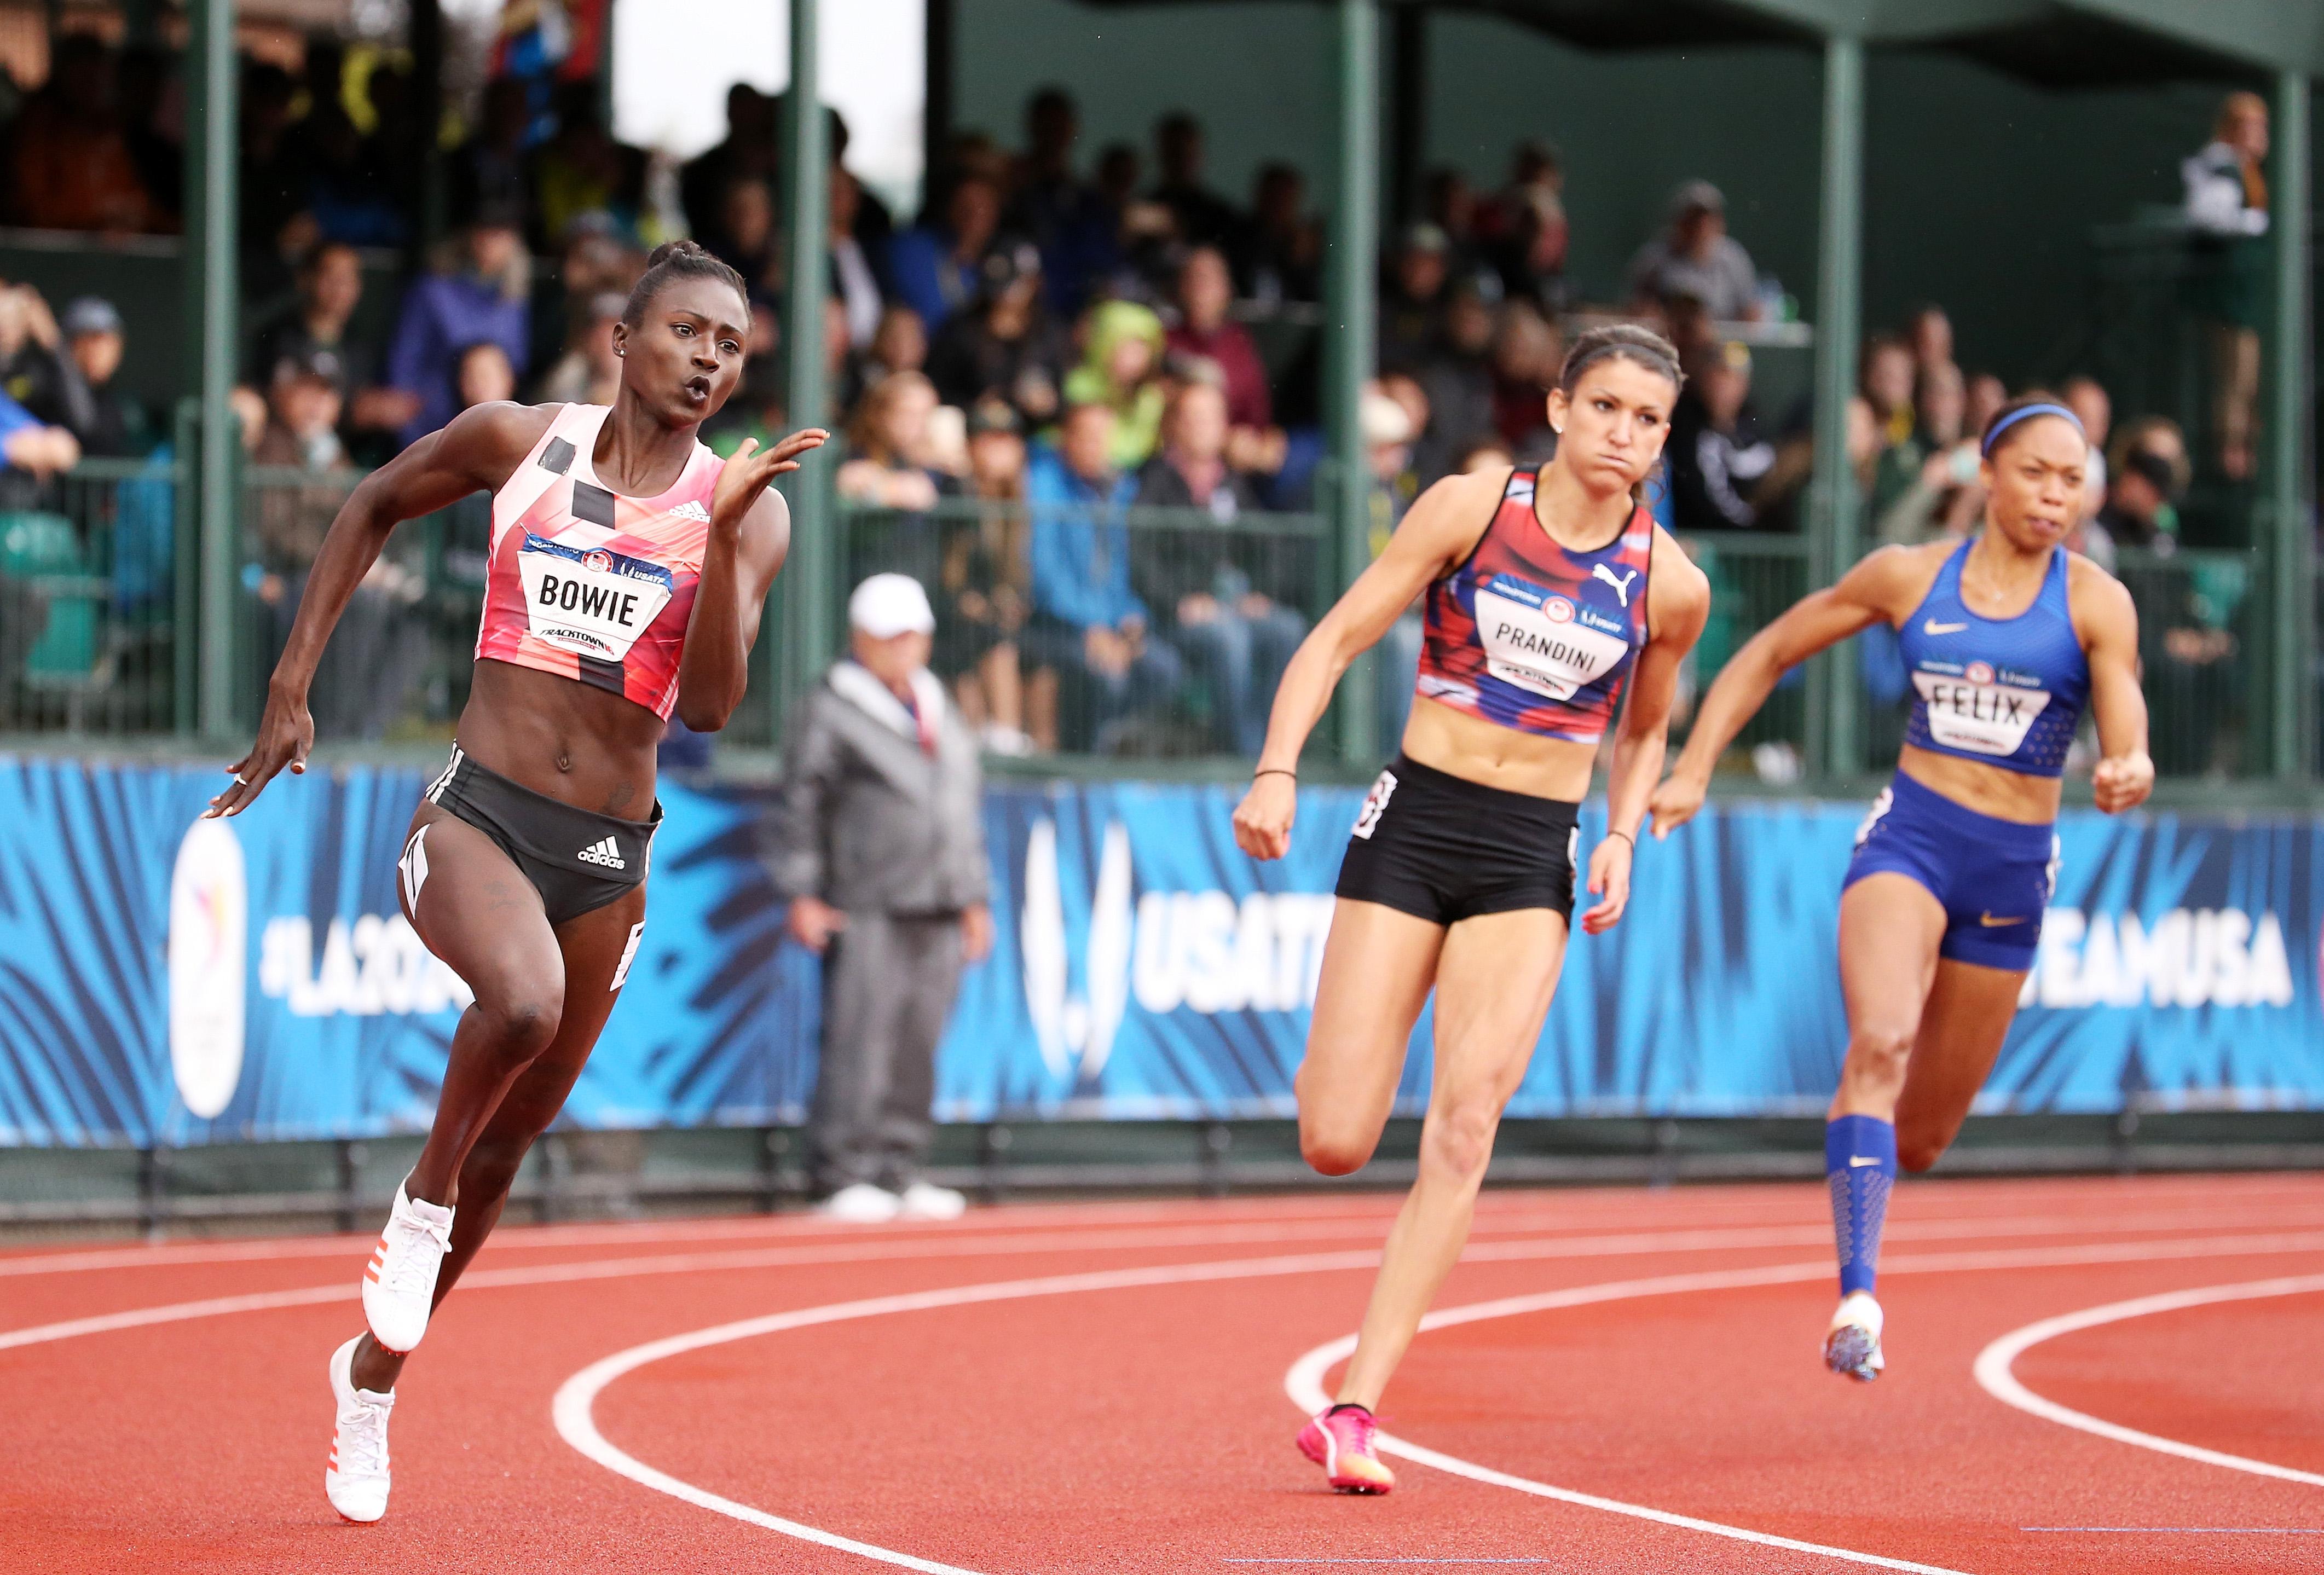 Hook athletes up at olympics 2019